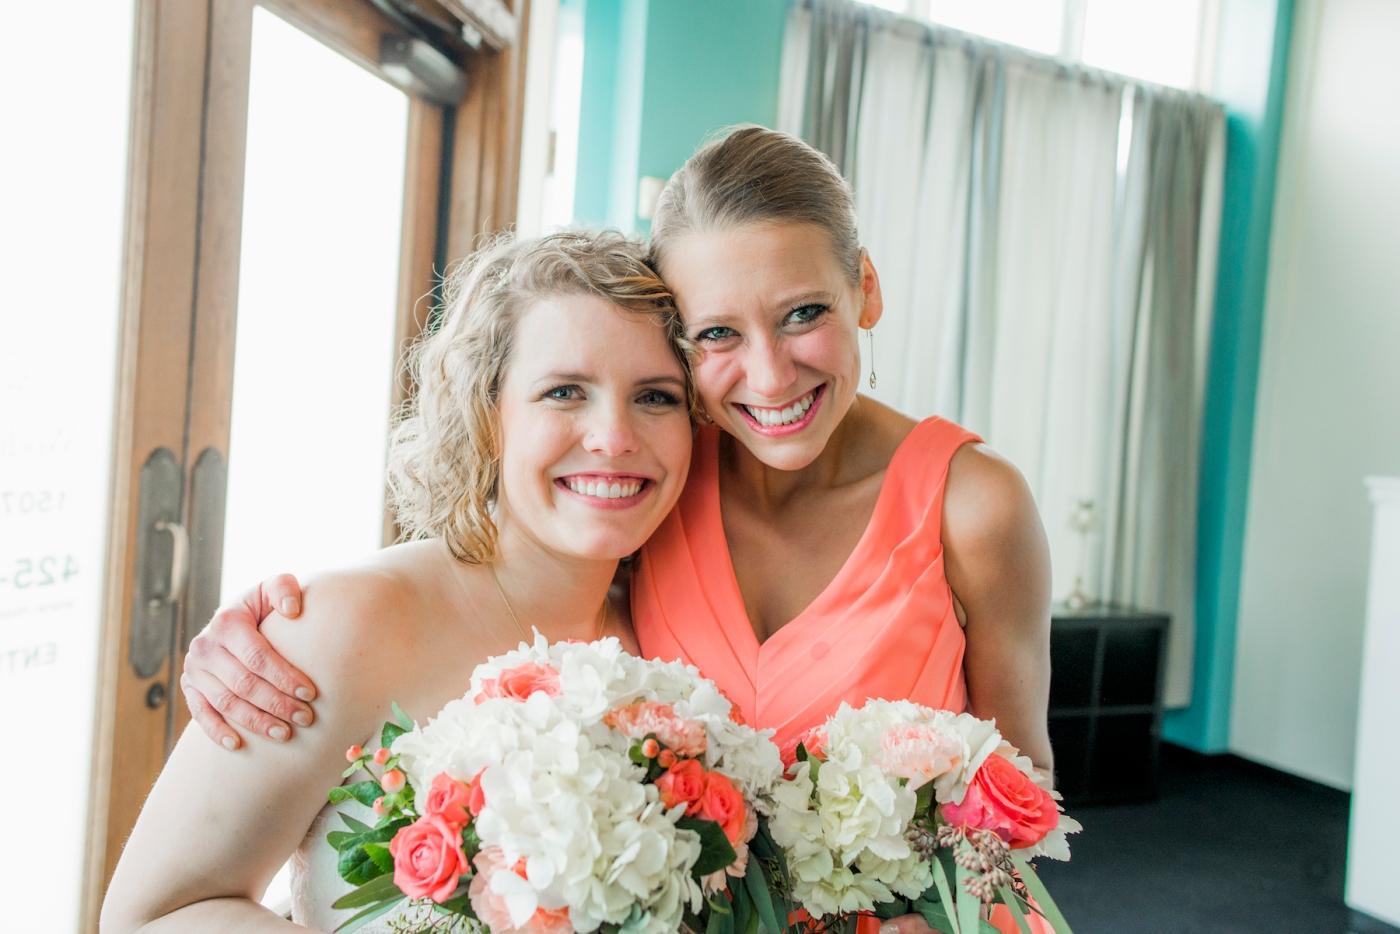 DSC_2862Everett_Wedding_Ballroom_Jane_Speleers_photography_Rachel_and_Edmund_bridesmaids_2017